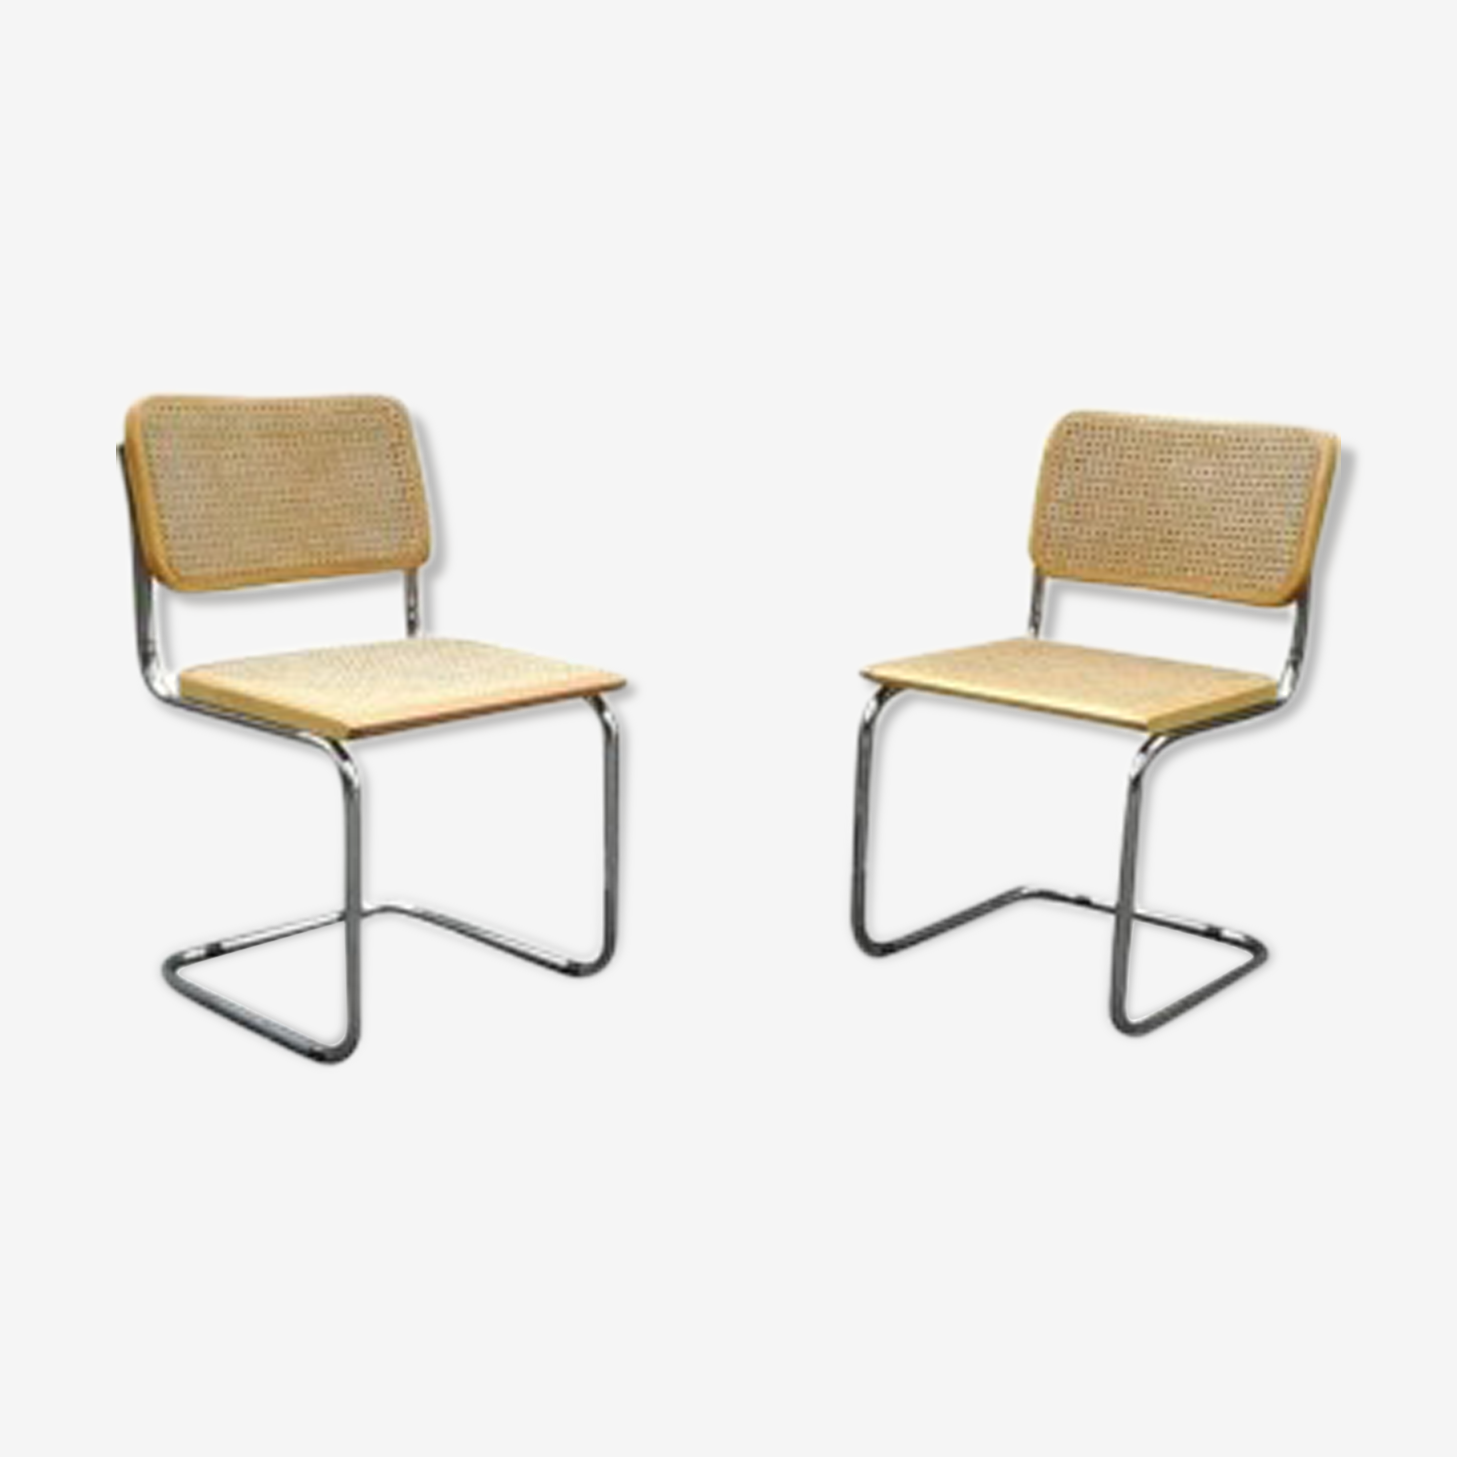 Pair of chairs Marcel Breuer B32